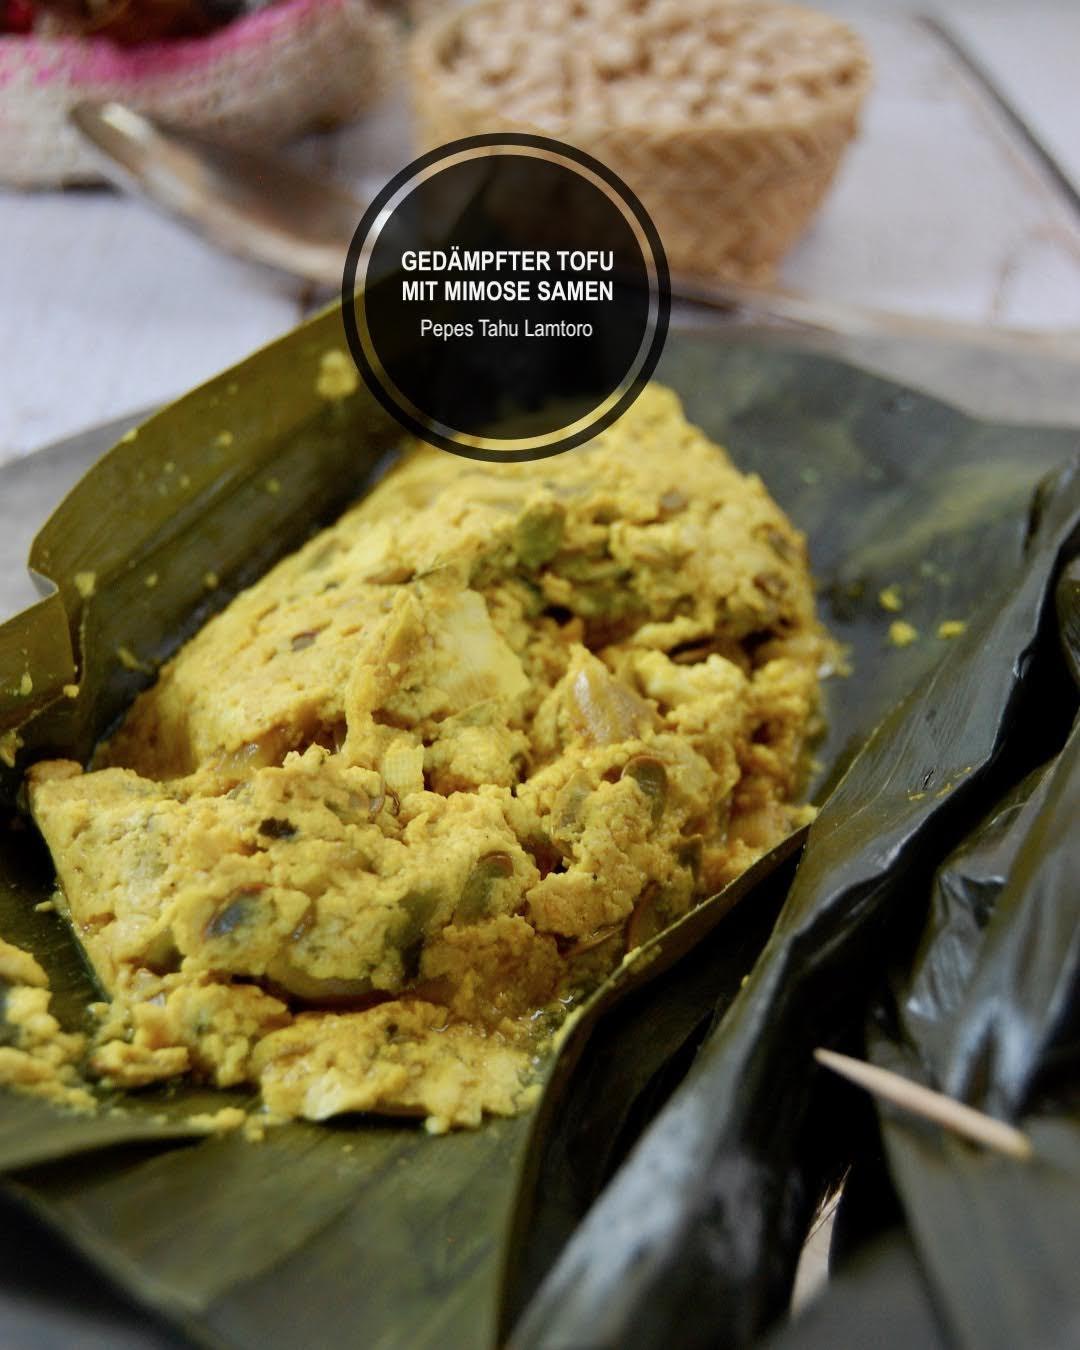 Rezept Gedämpfter Tofu mit Mimose Samen, Pepes Tahu Lamtoro indonesisch kochen